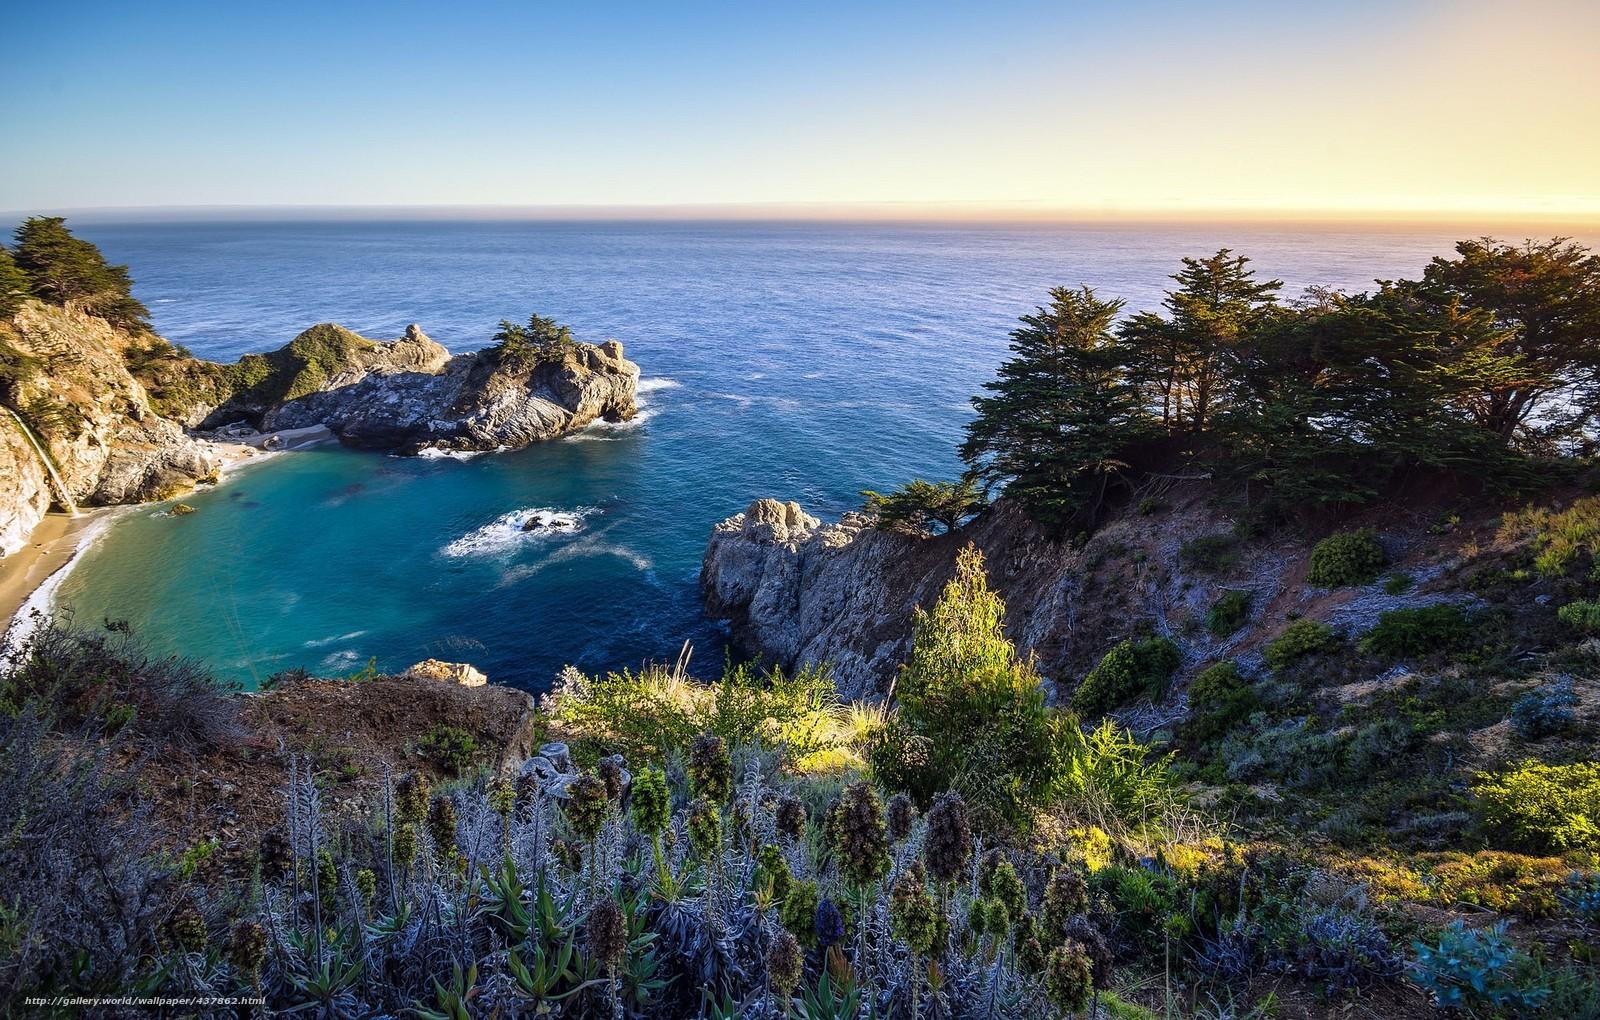 Tlcharger fond d 39 ecran beau paysage lever du soleil mer for Beau fond ecran